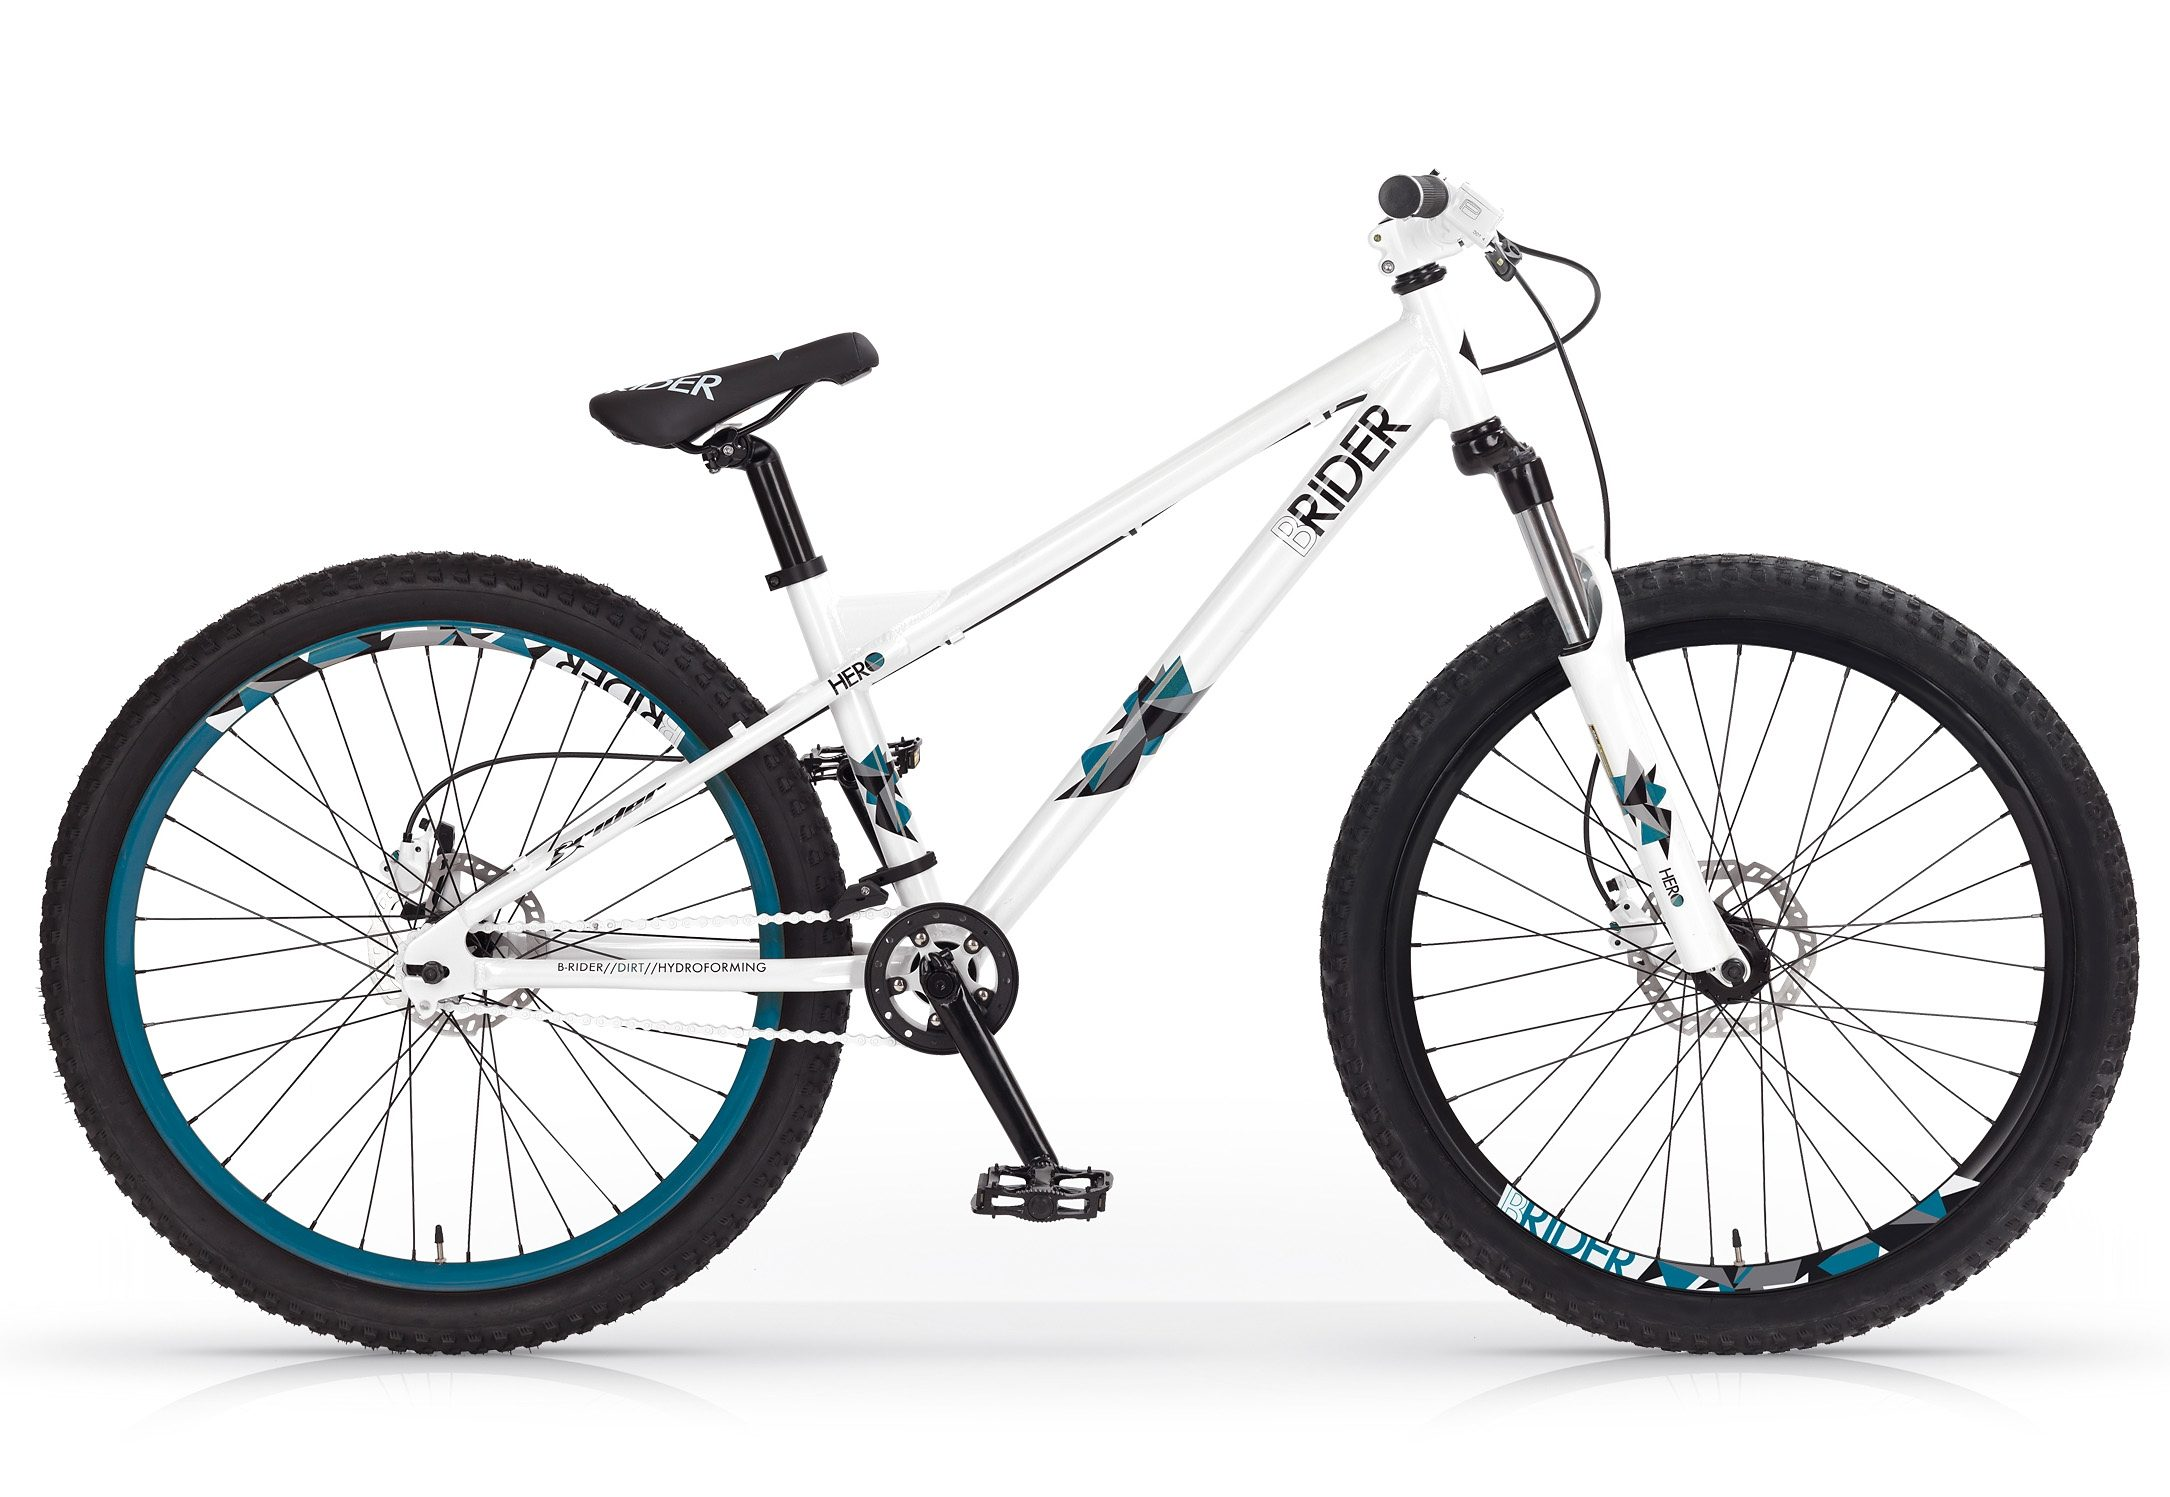 Dirtbike, 26 Zoll, weiß-blau, »Hero Disc«, MBM